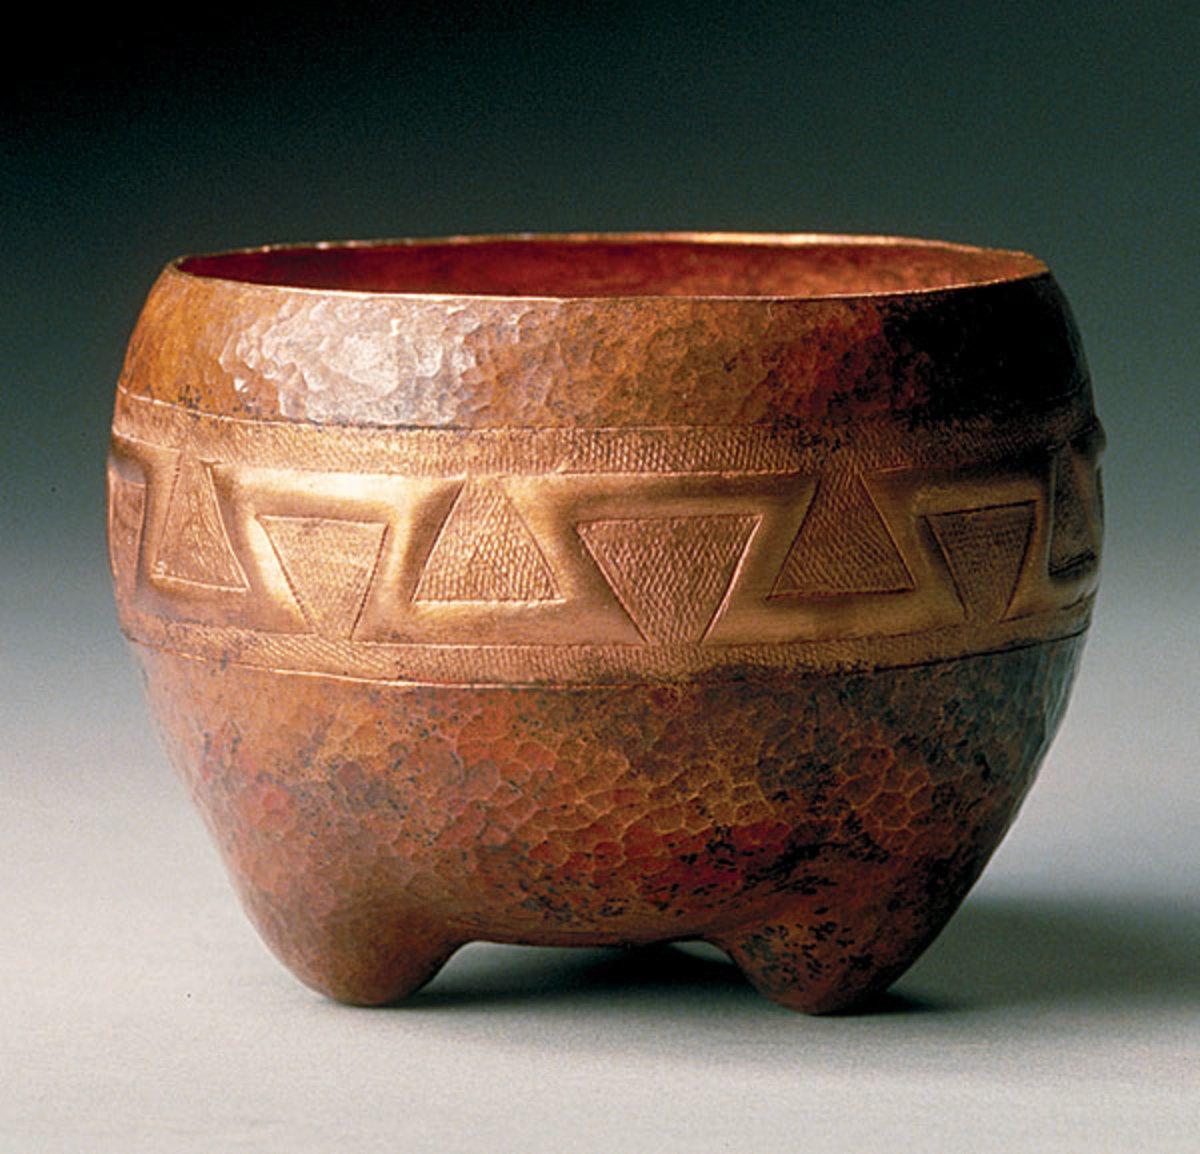 An Aztec bowl